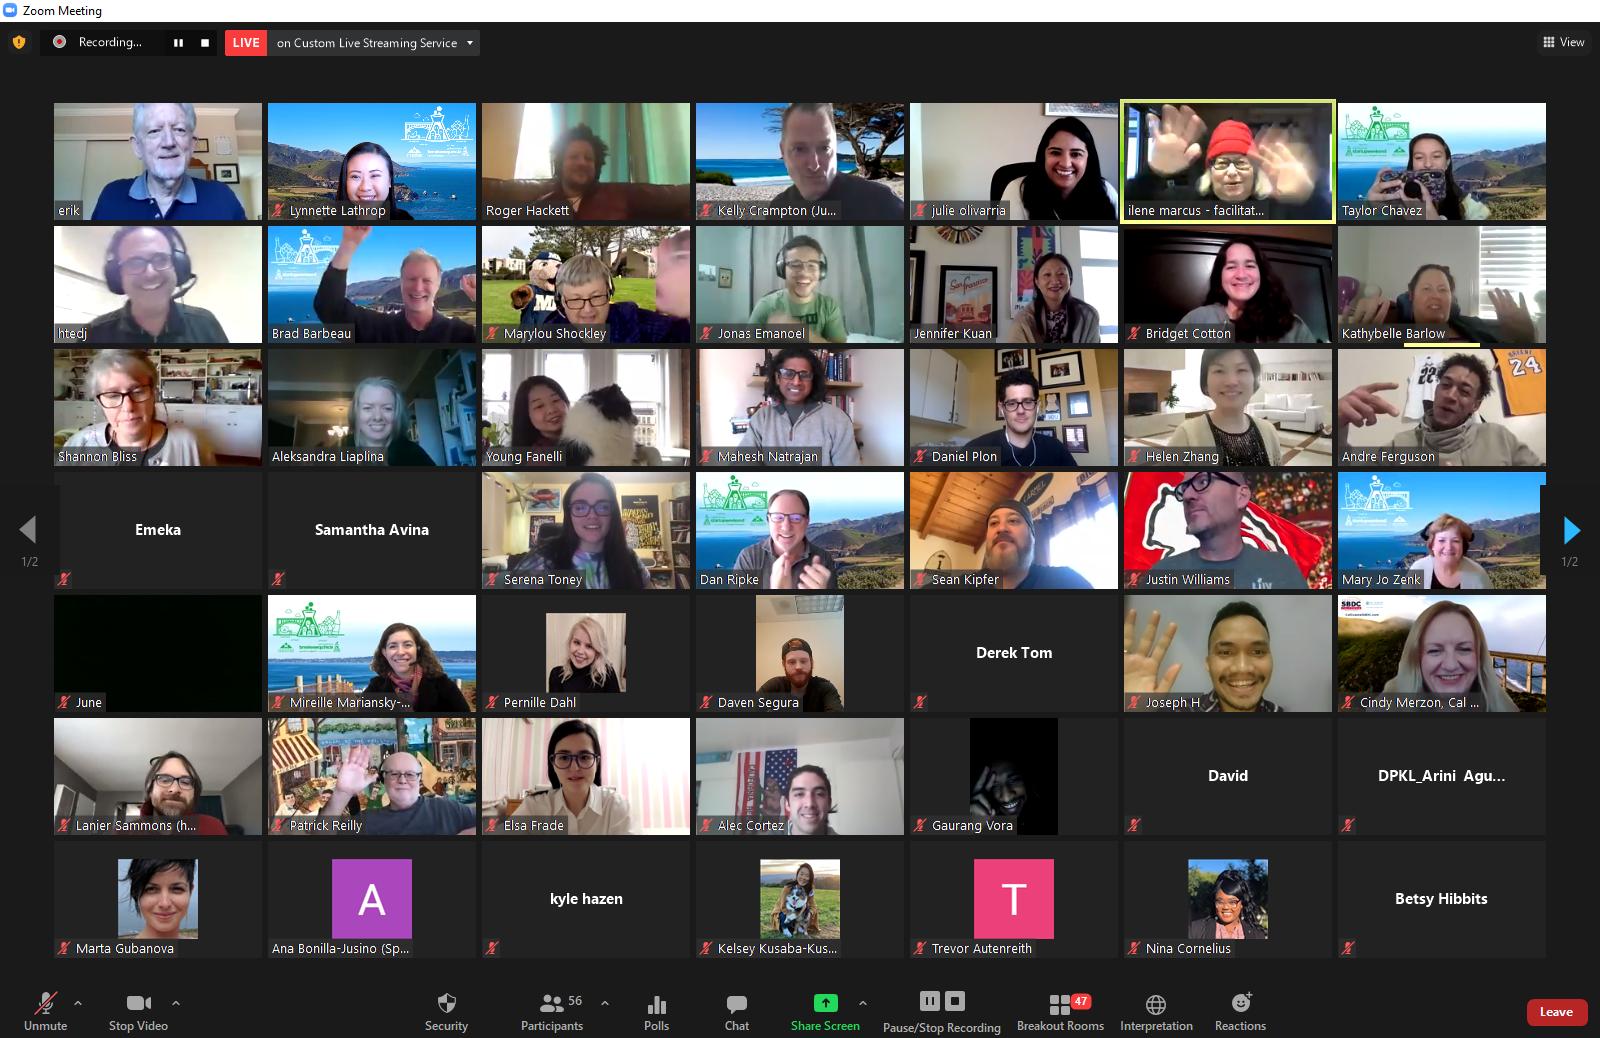 Techstars Startup Weekend Monterey Bay 2021 online event participants on Zoom